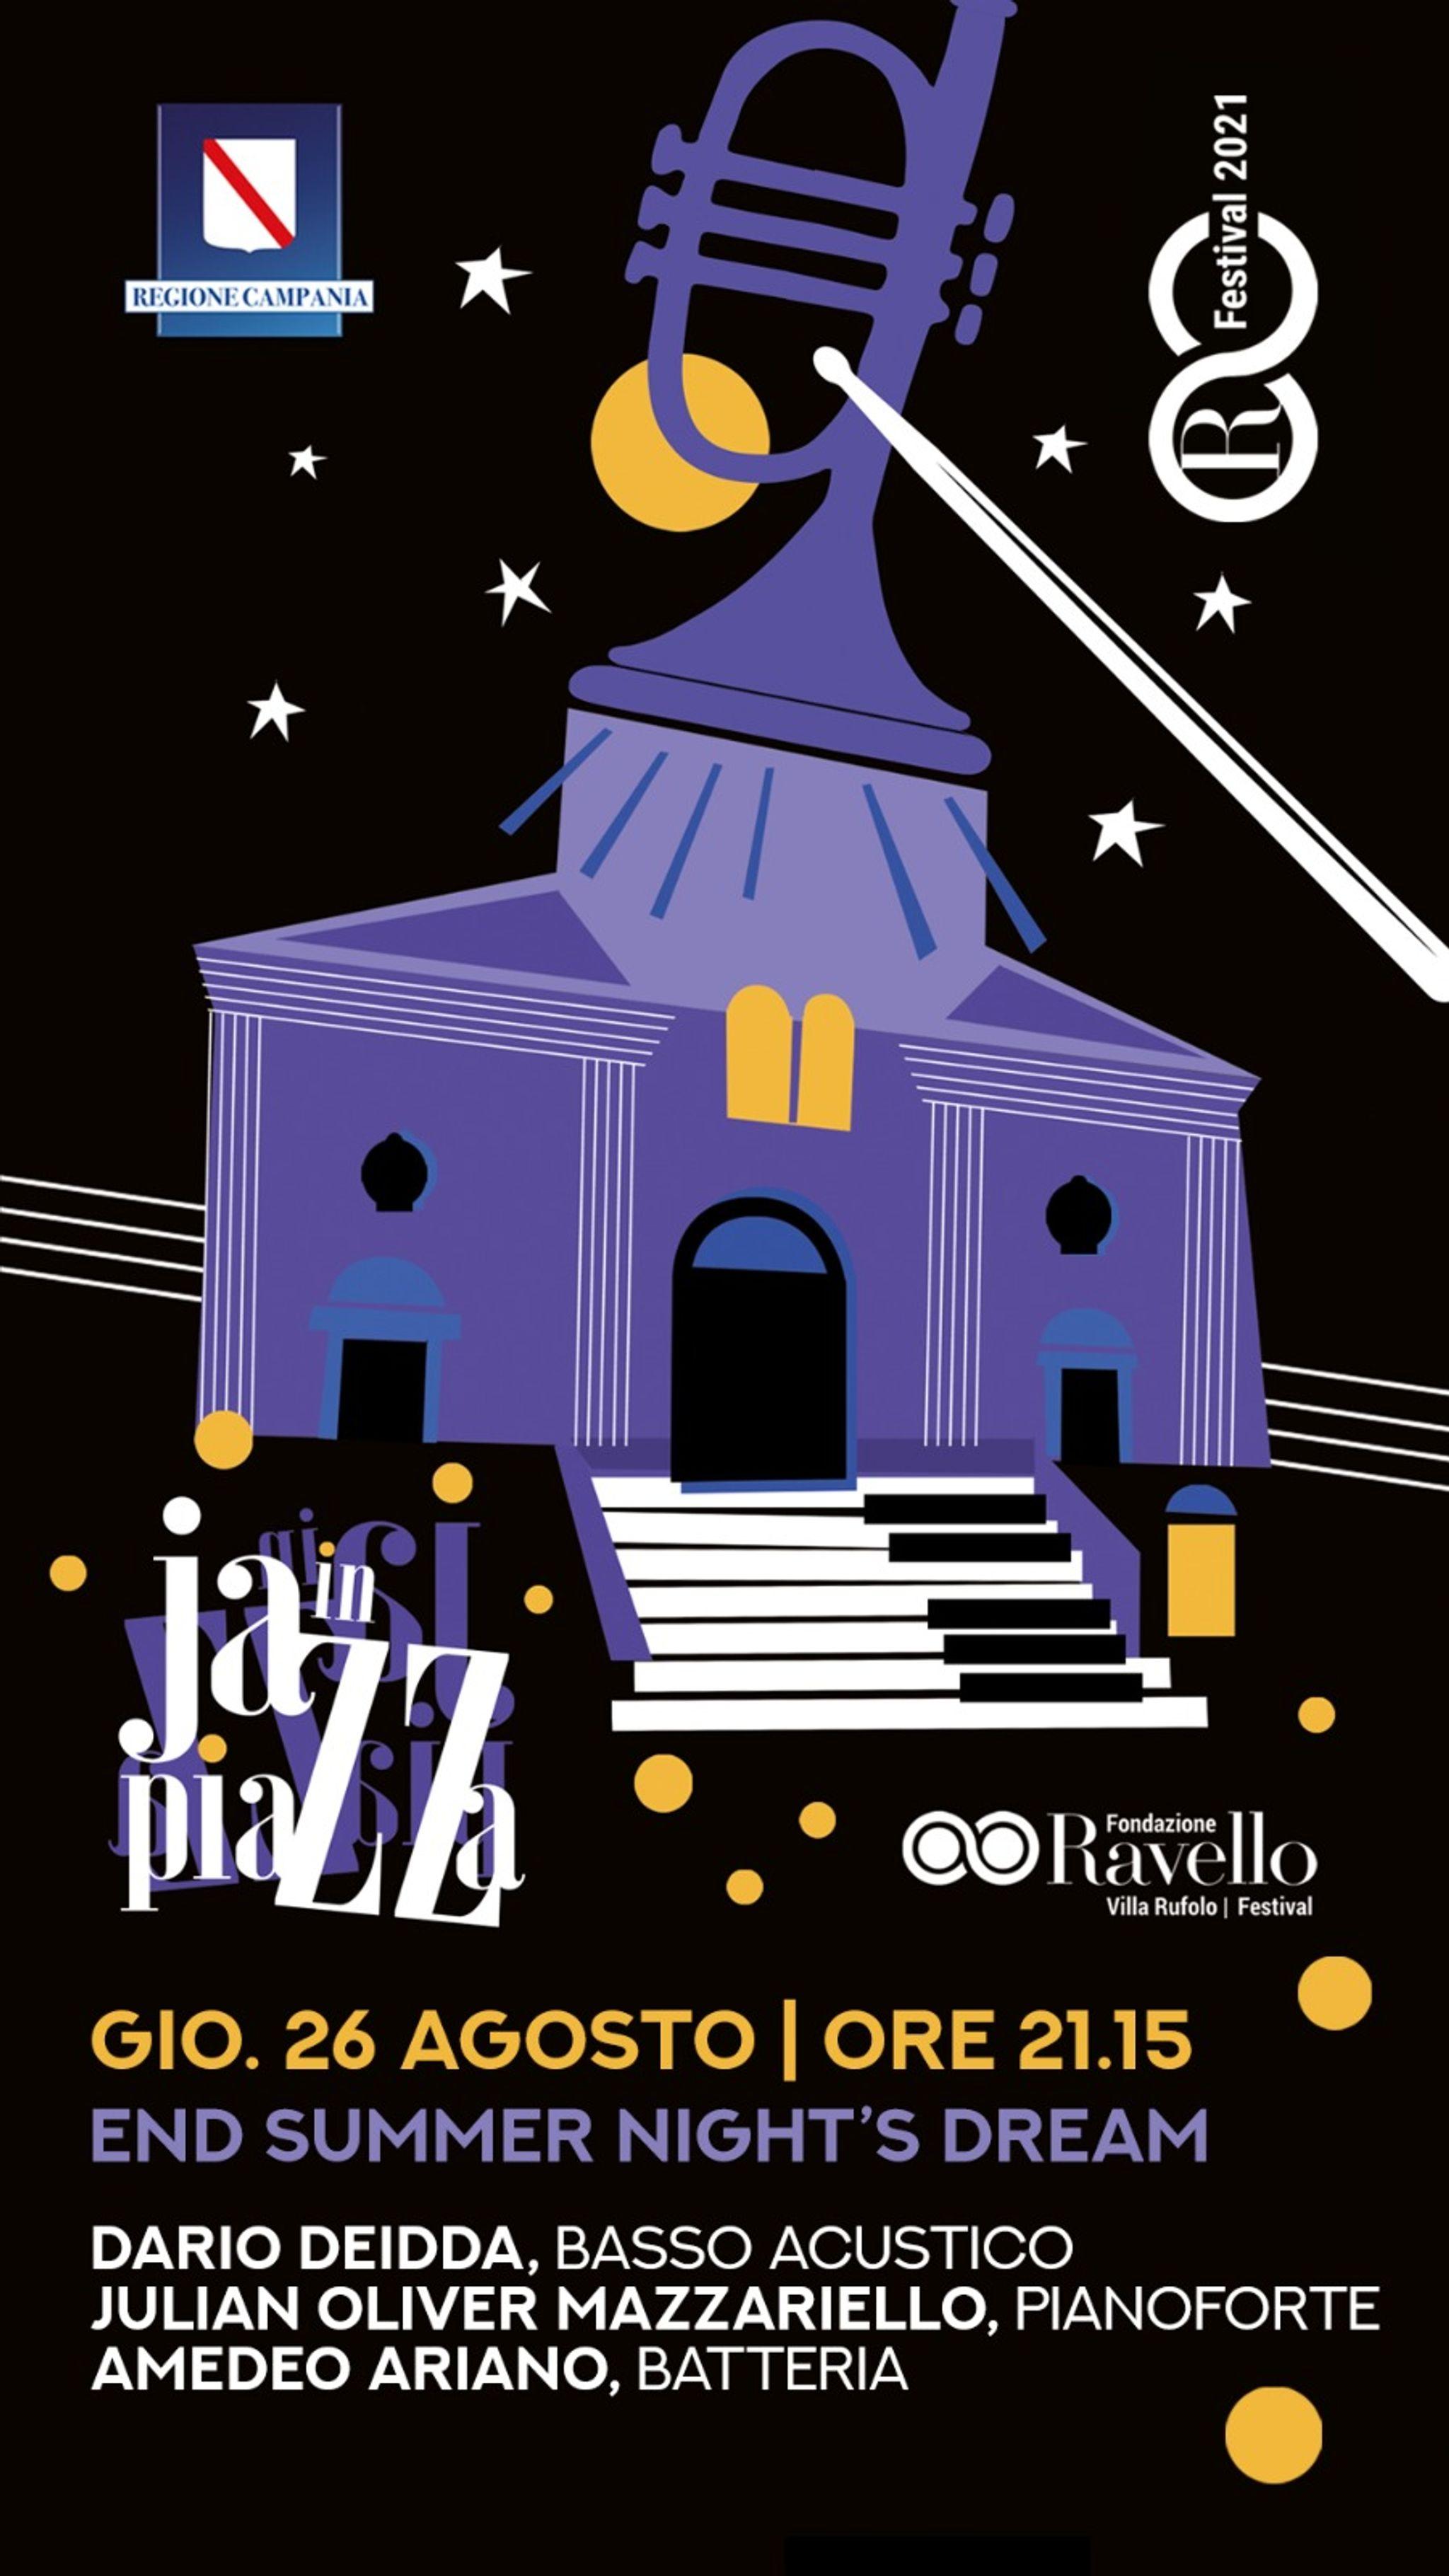 Jazz in Piazza: End summer night's dream